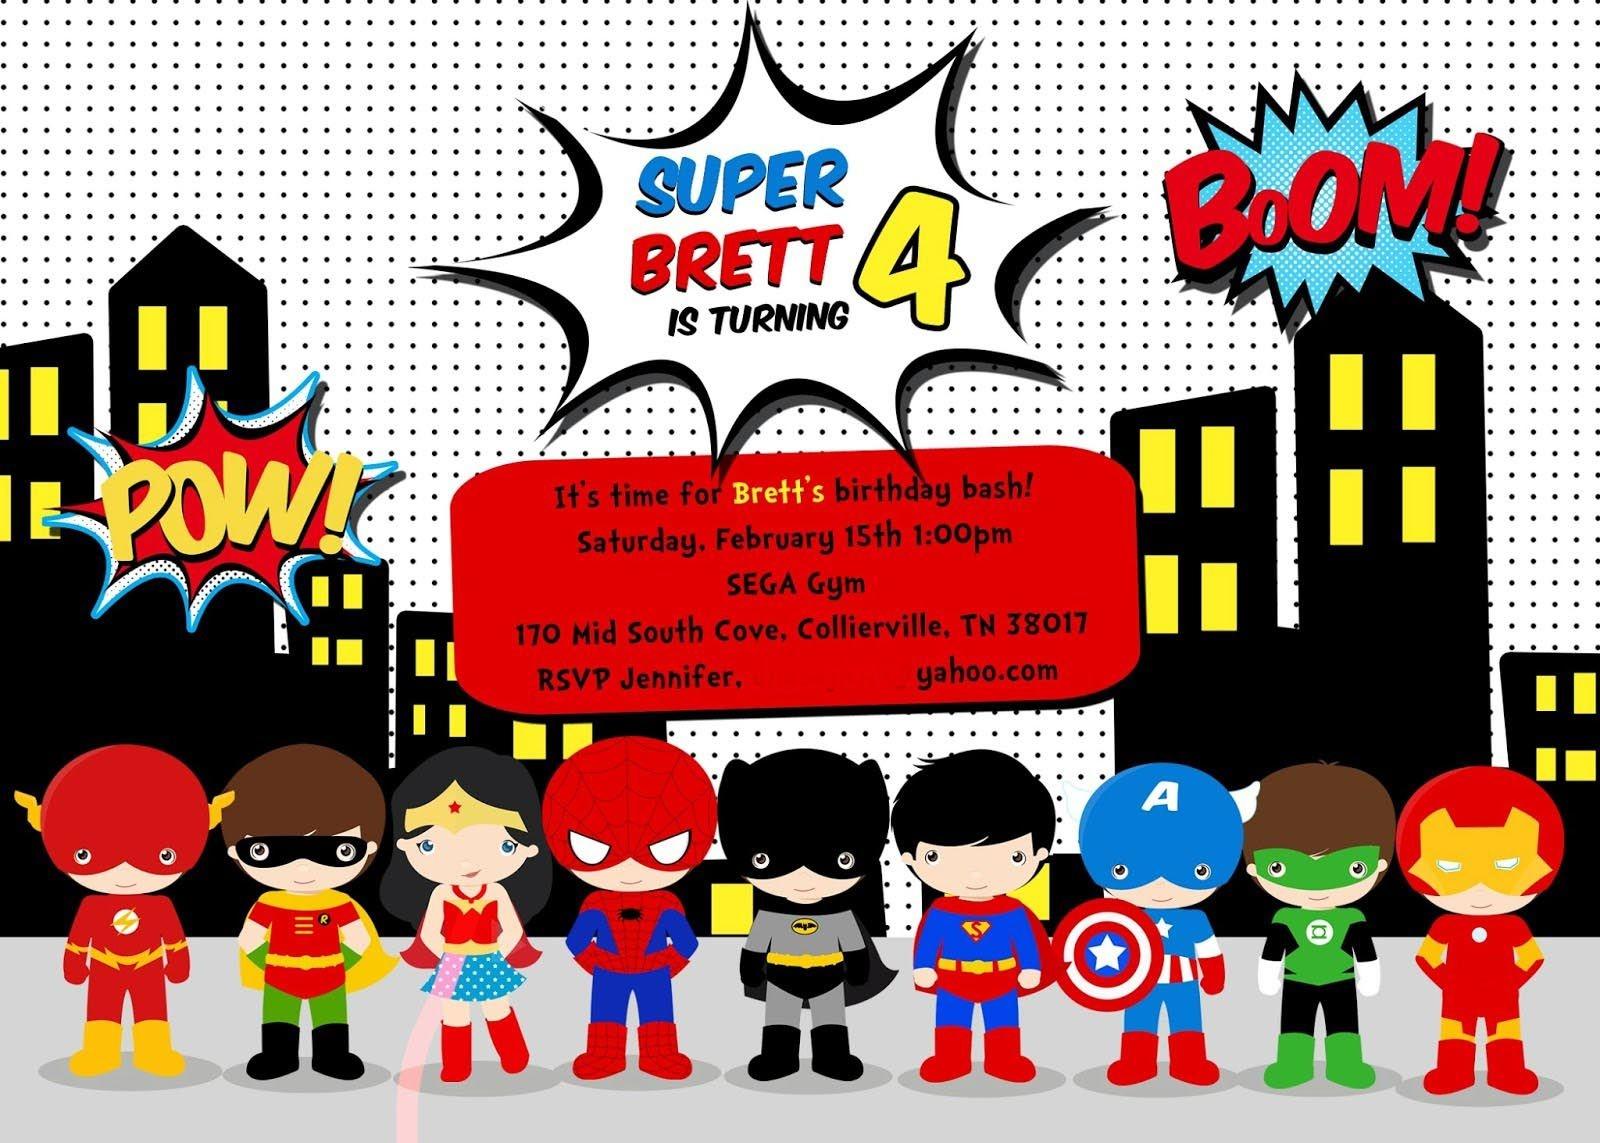 Free Superhero Birthday Party Invitation Templates | Birthday Party - Free Printable Superhero Birthday Invitation Templates